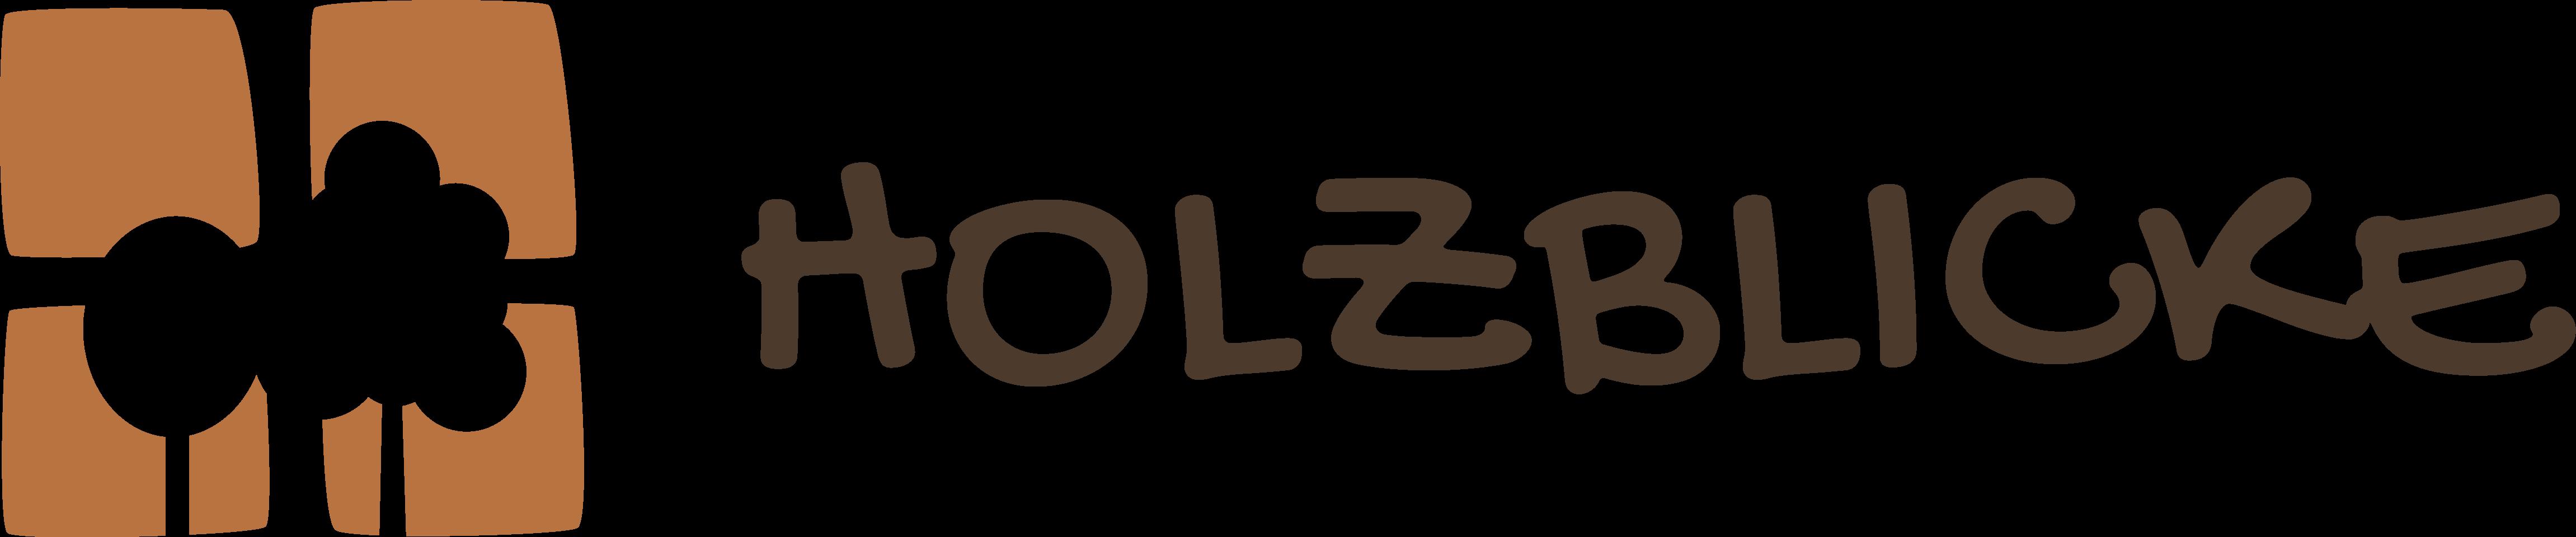 Holzblicke Logo